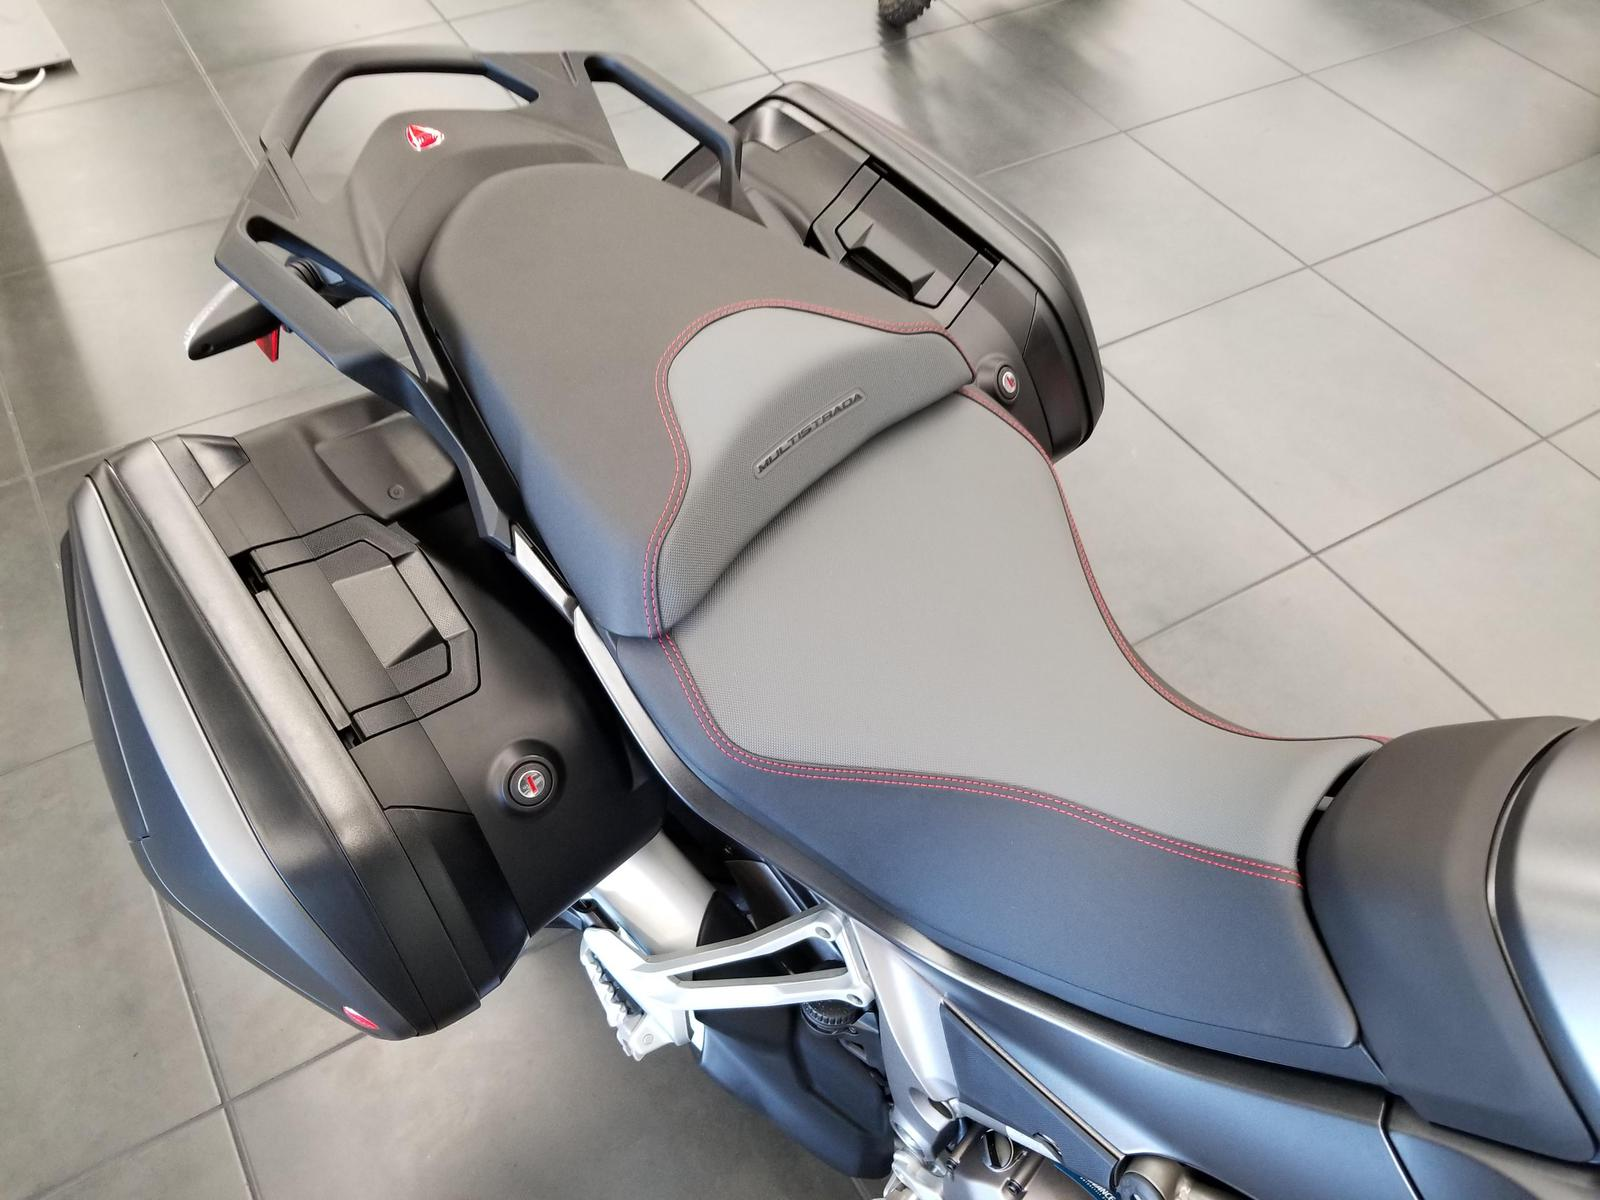 2019 Ducati Multistrada 1260 S - Volcano Grey